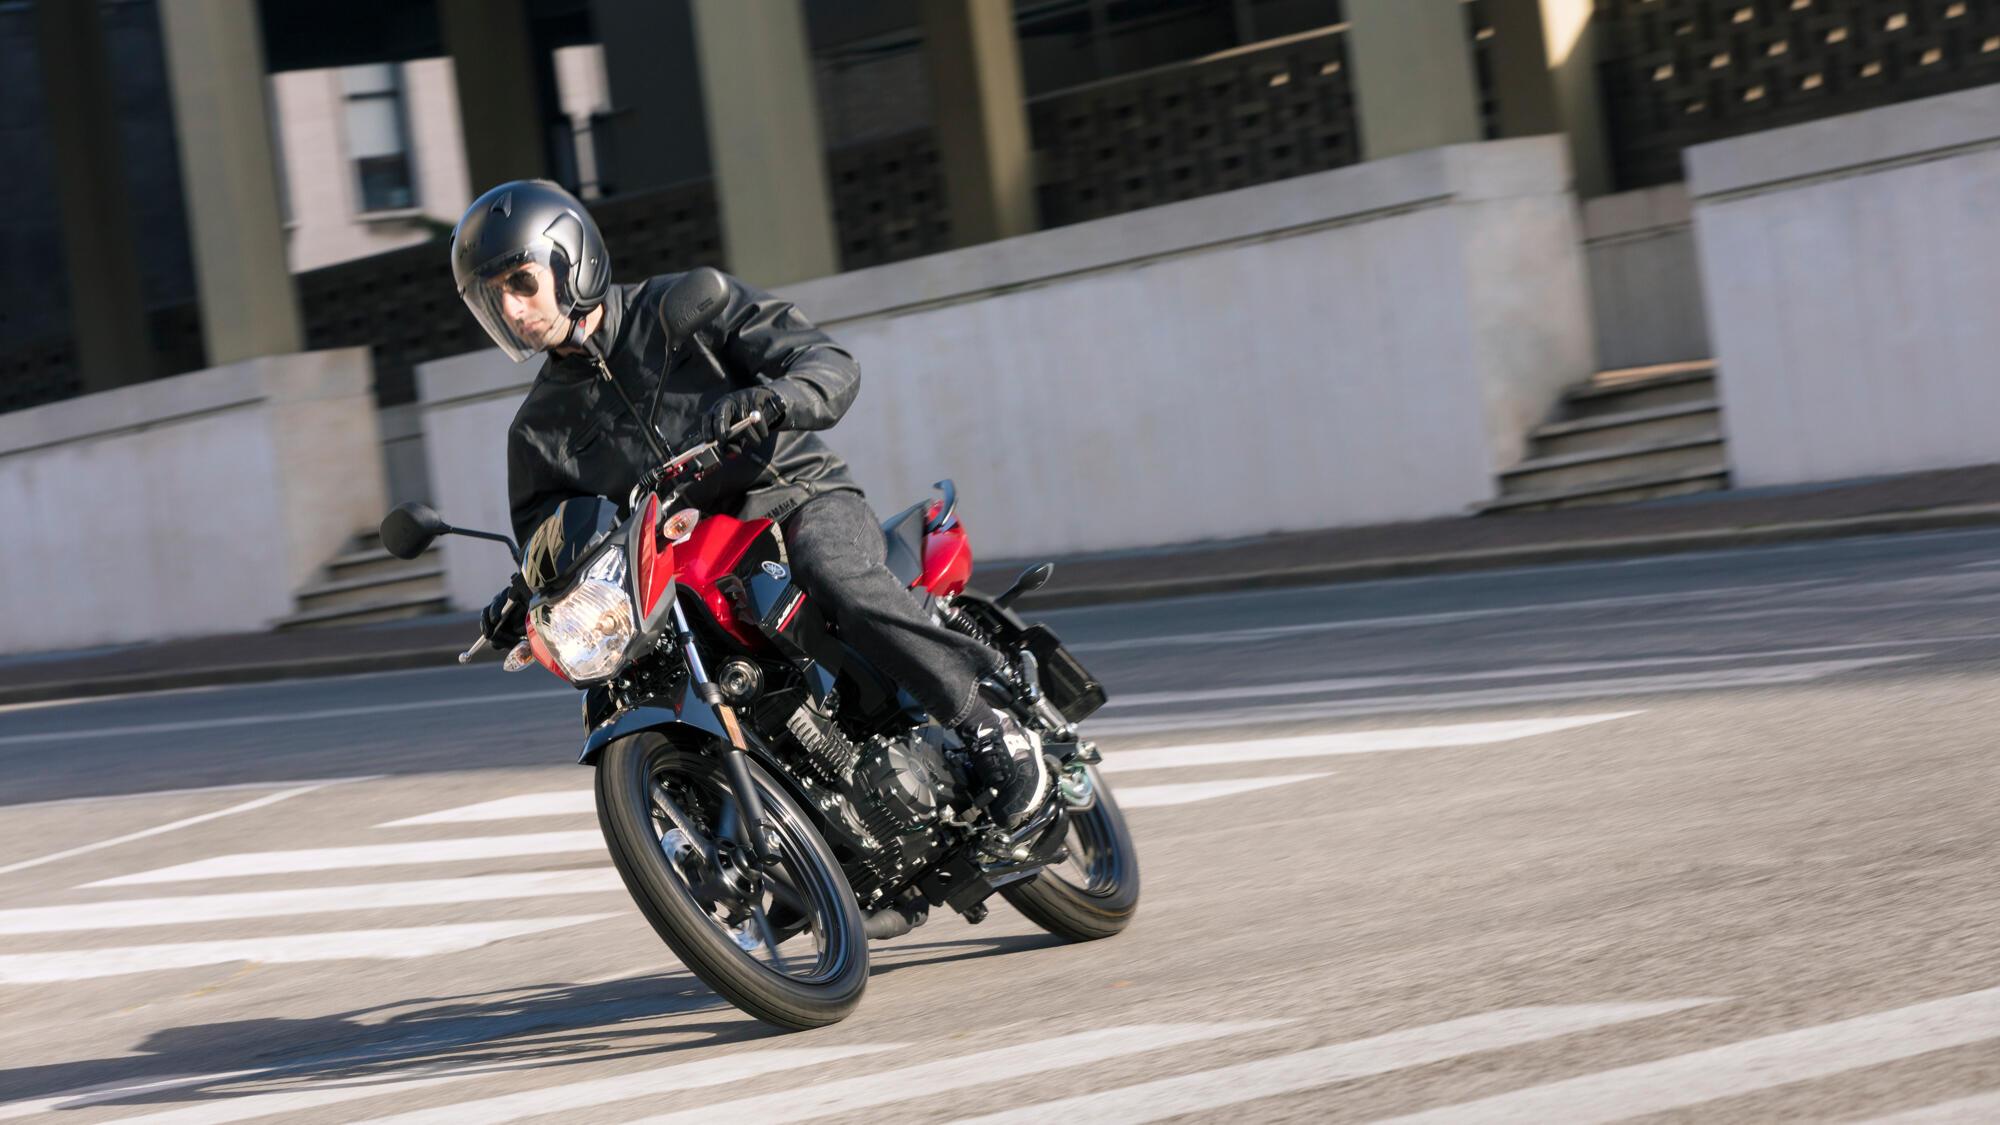 YS125 - motorcycles - Yamaha Motor